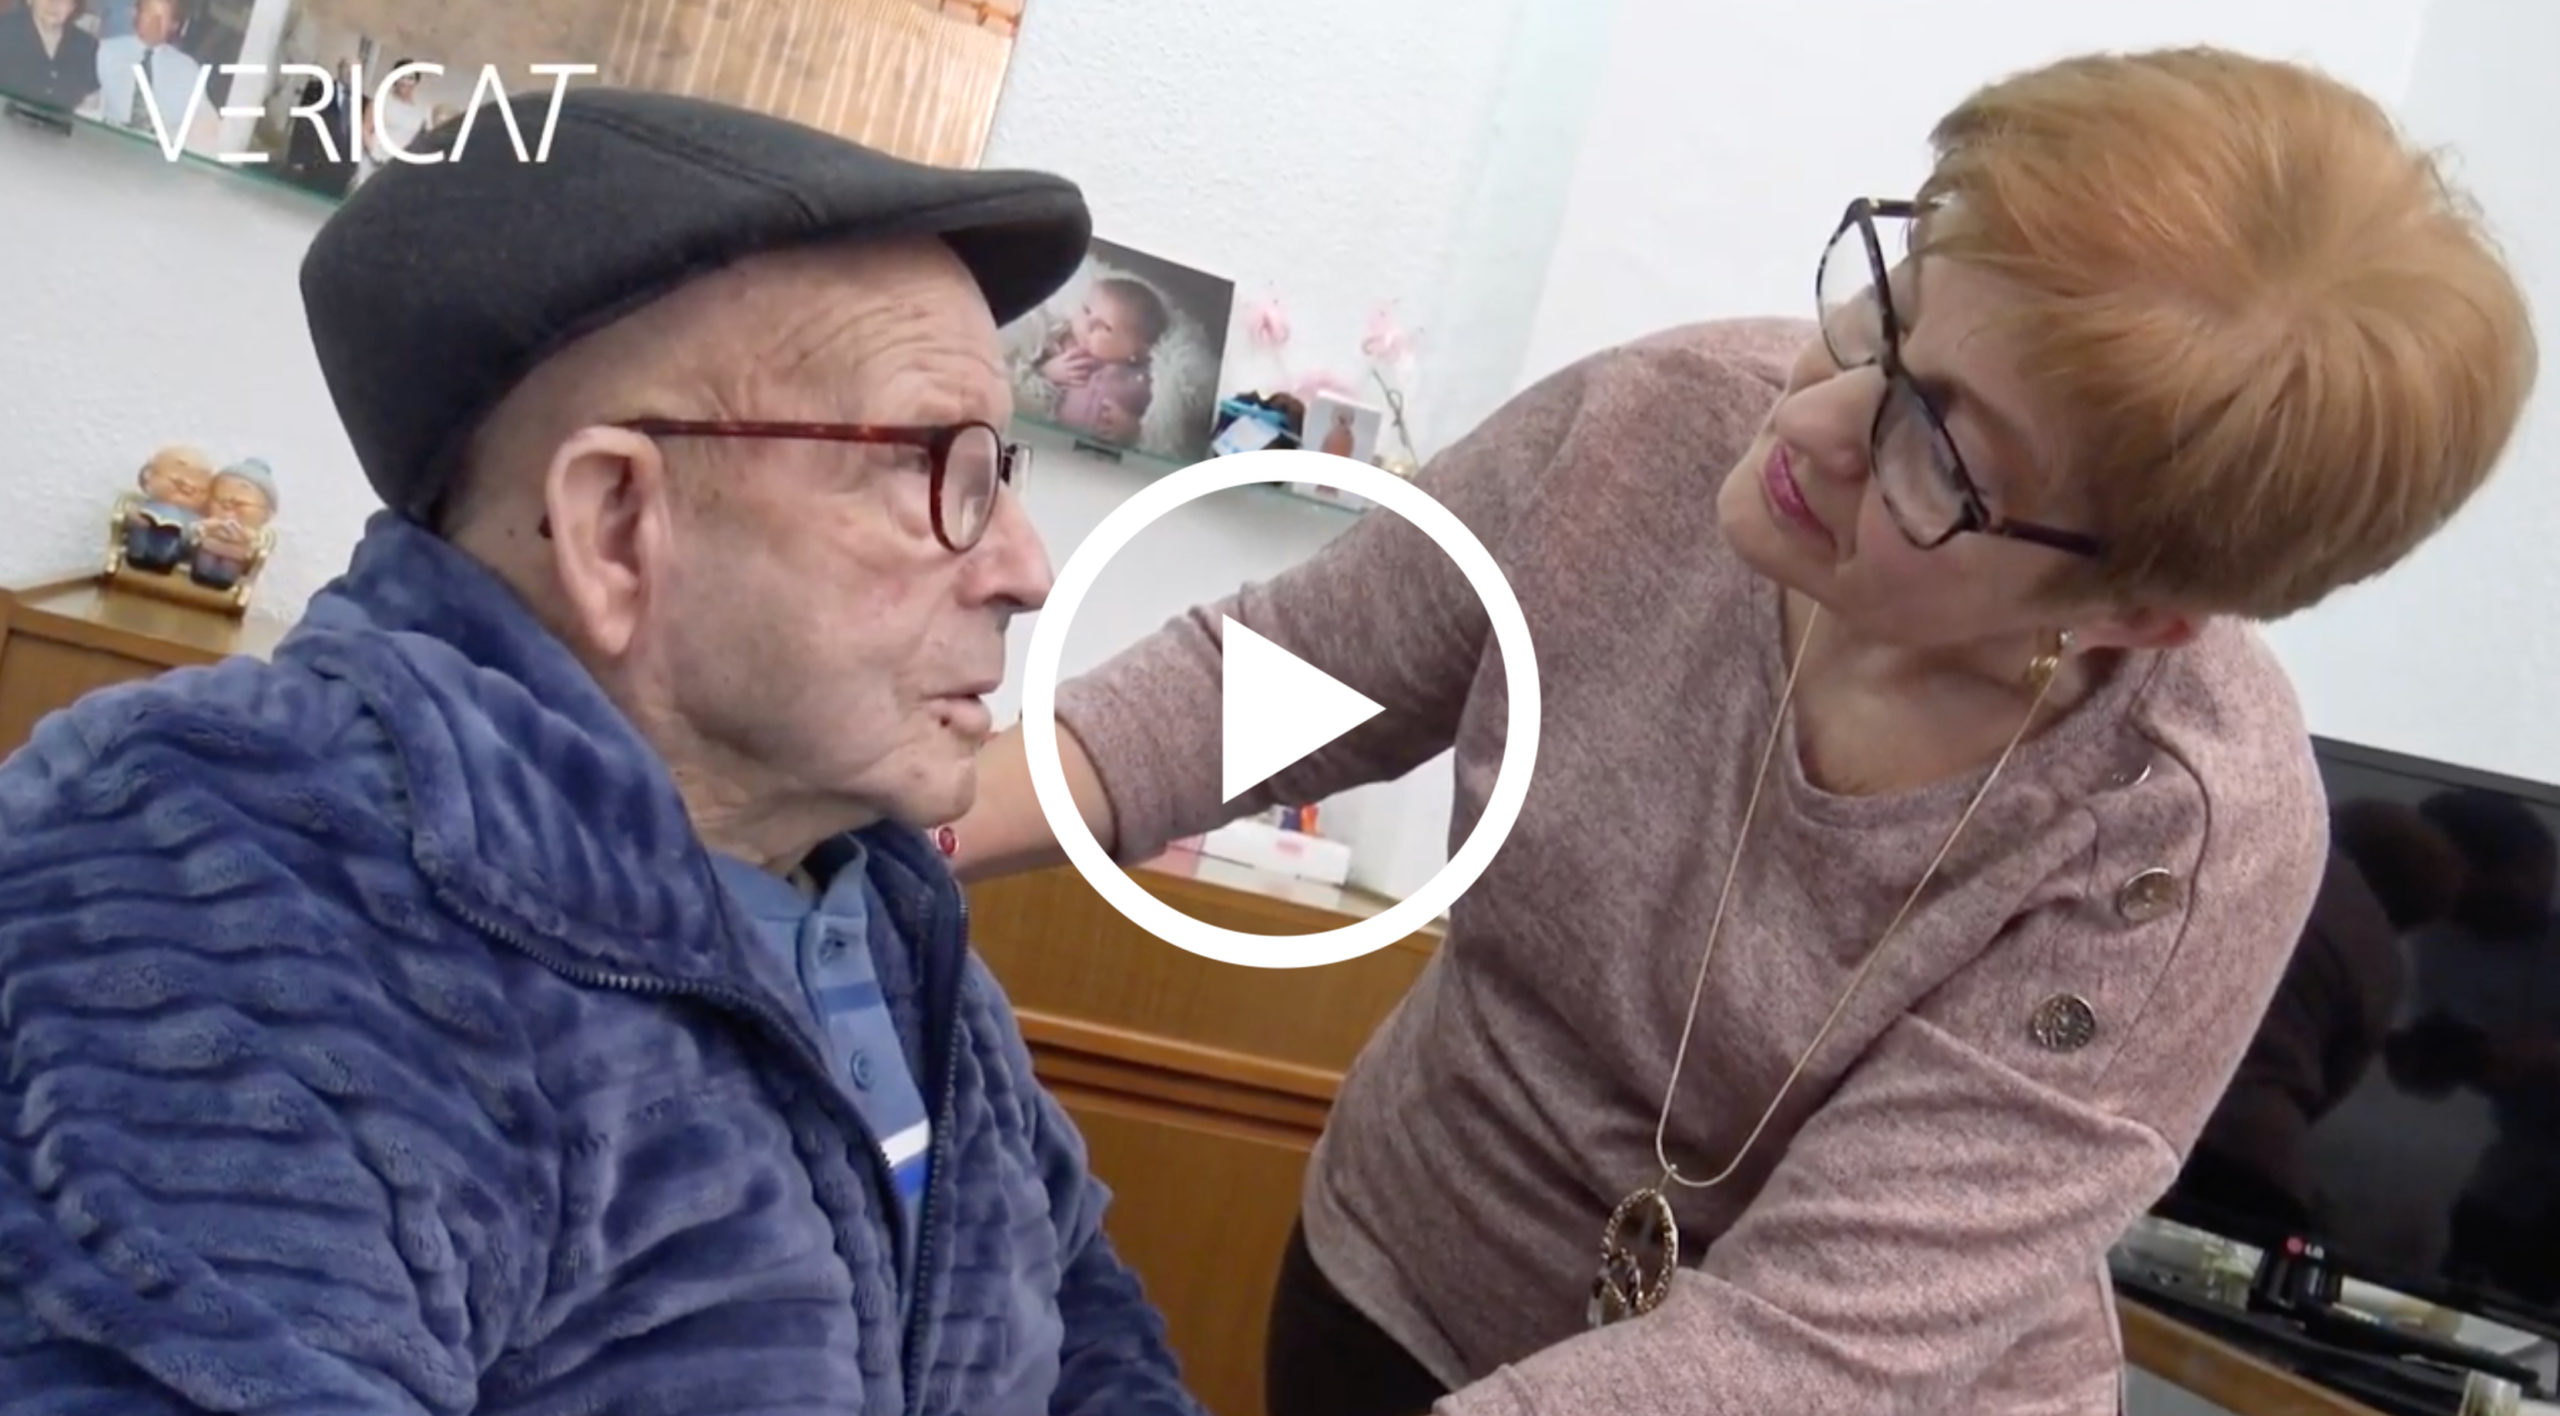 paciente vericat alzheimer